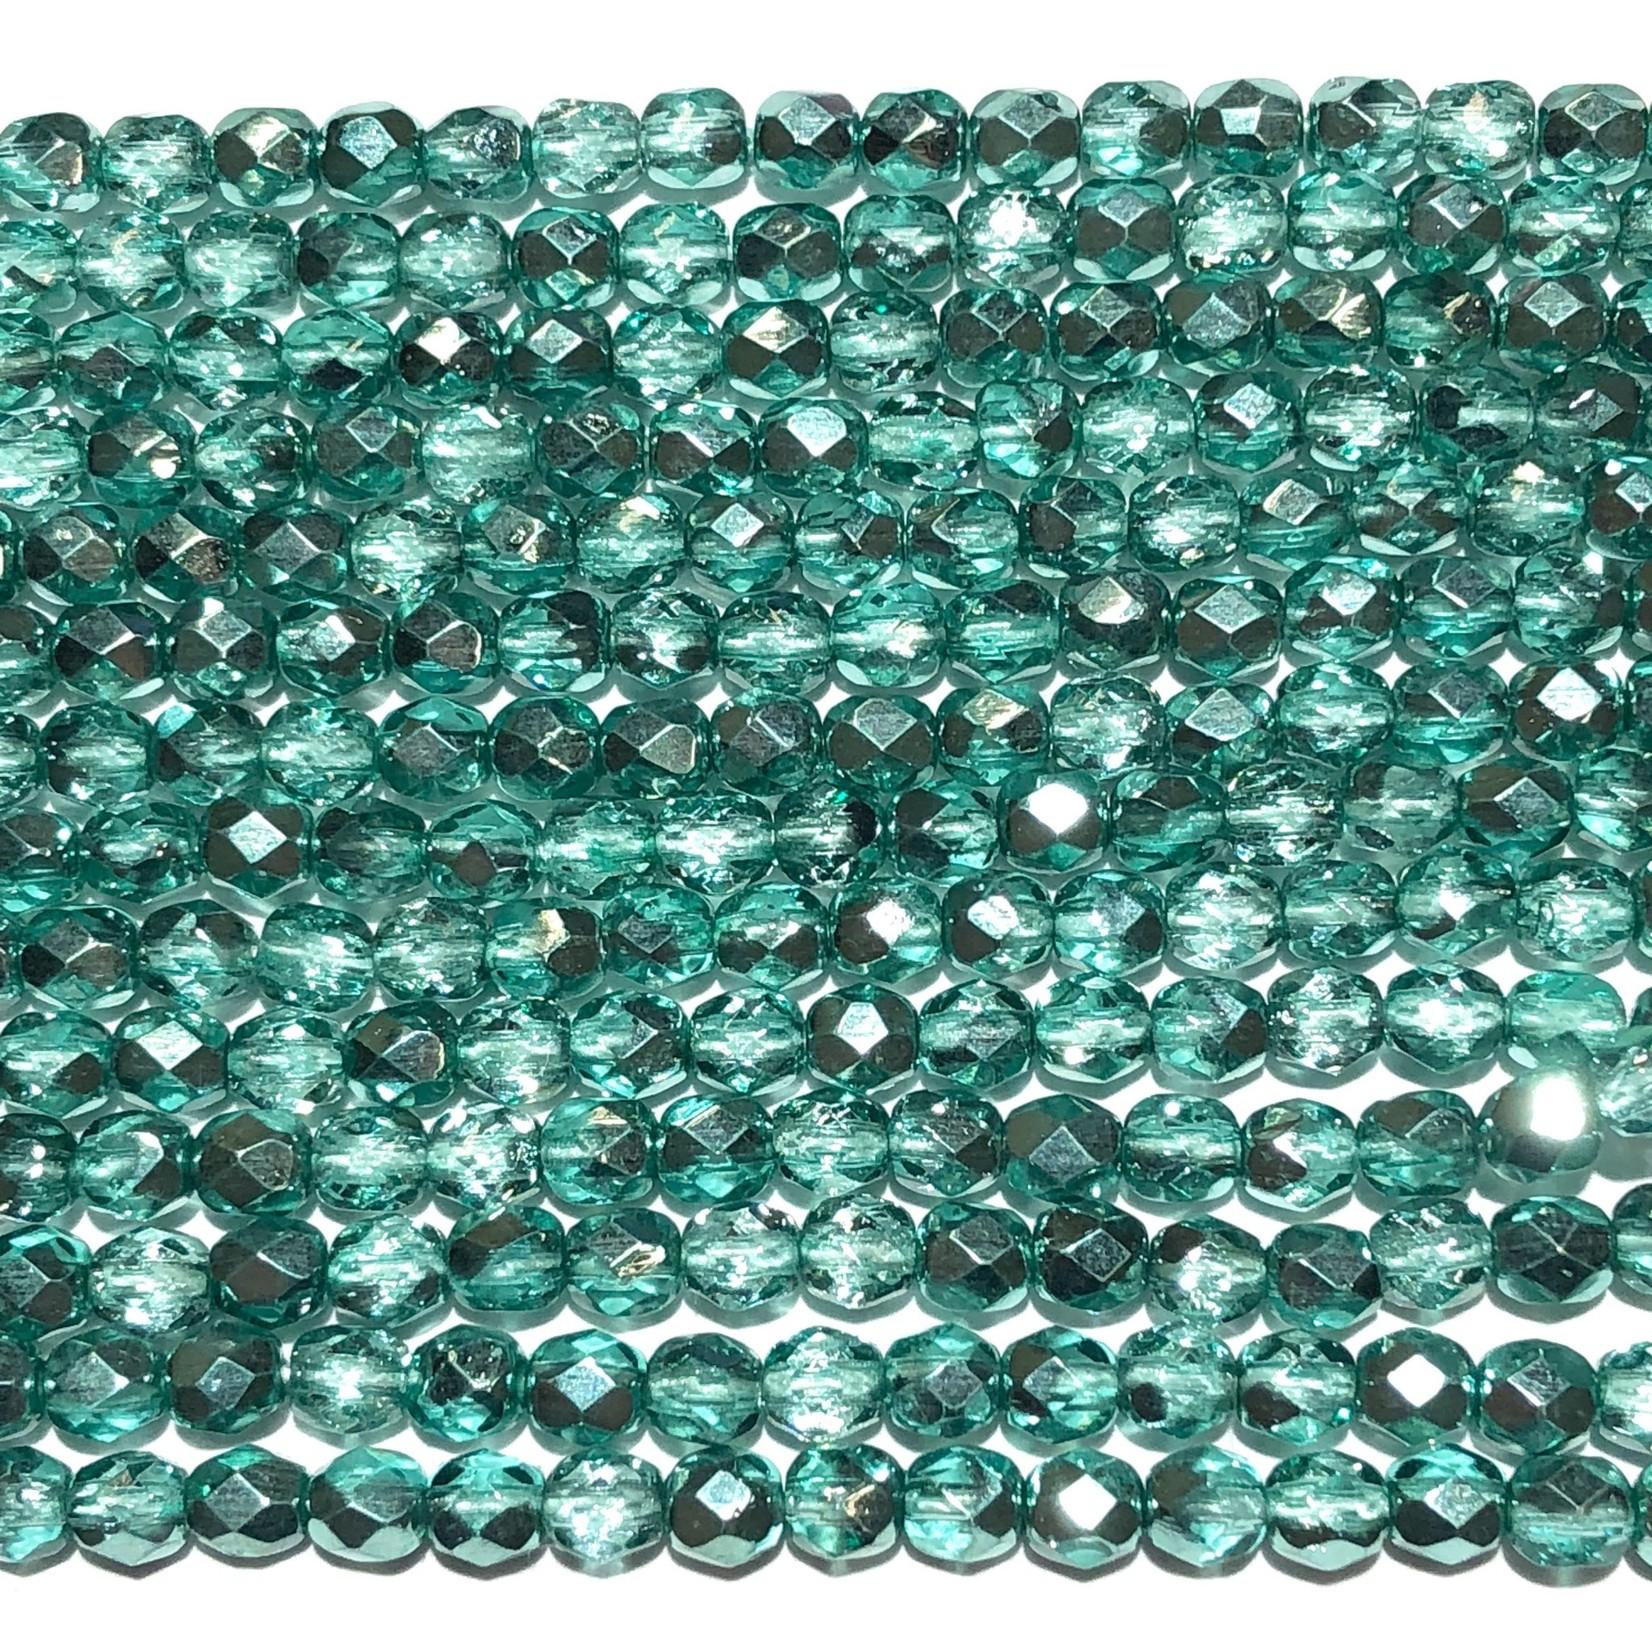 MATUBO Firepolish Metallic Crystal Aqua 4mm